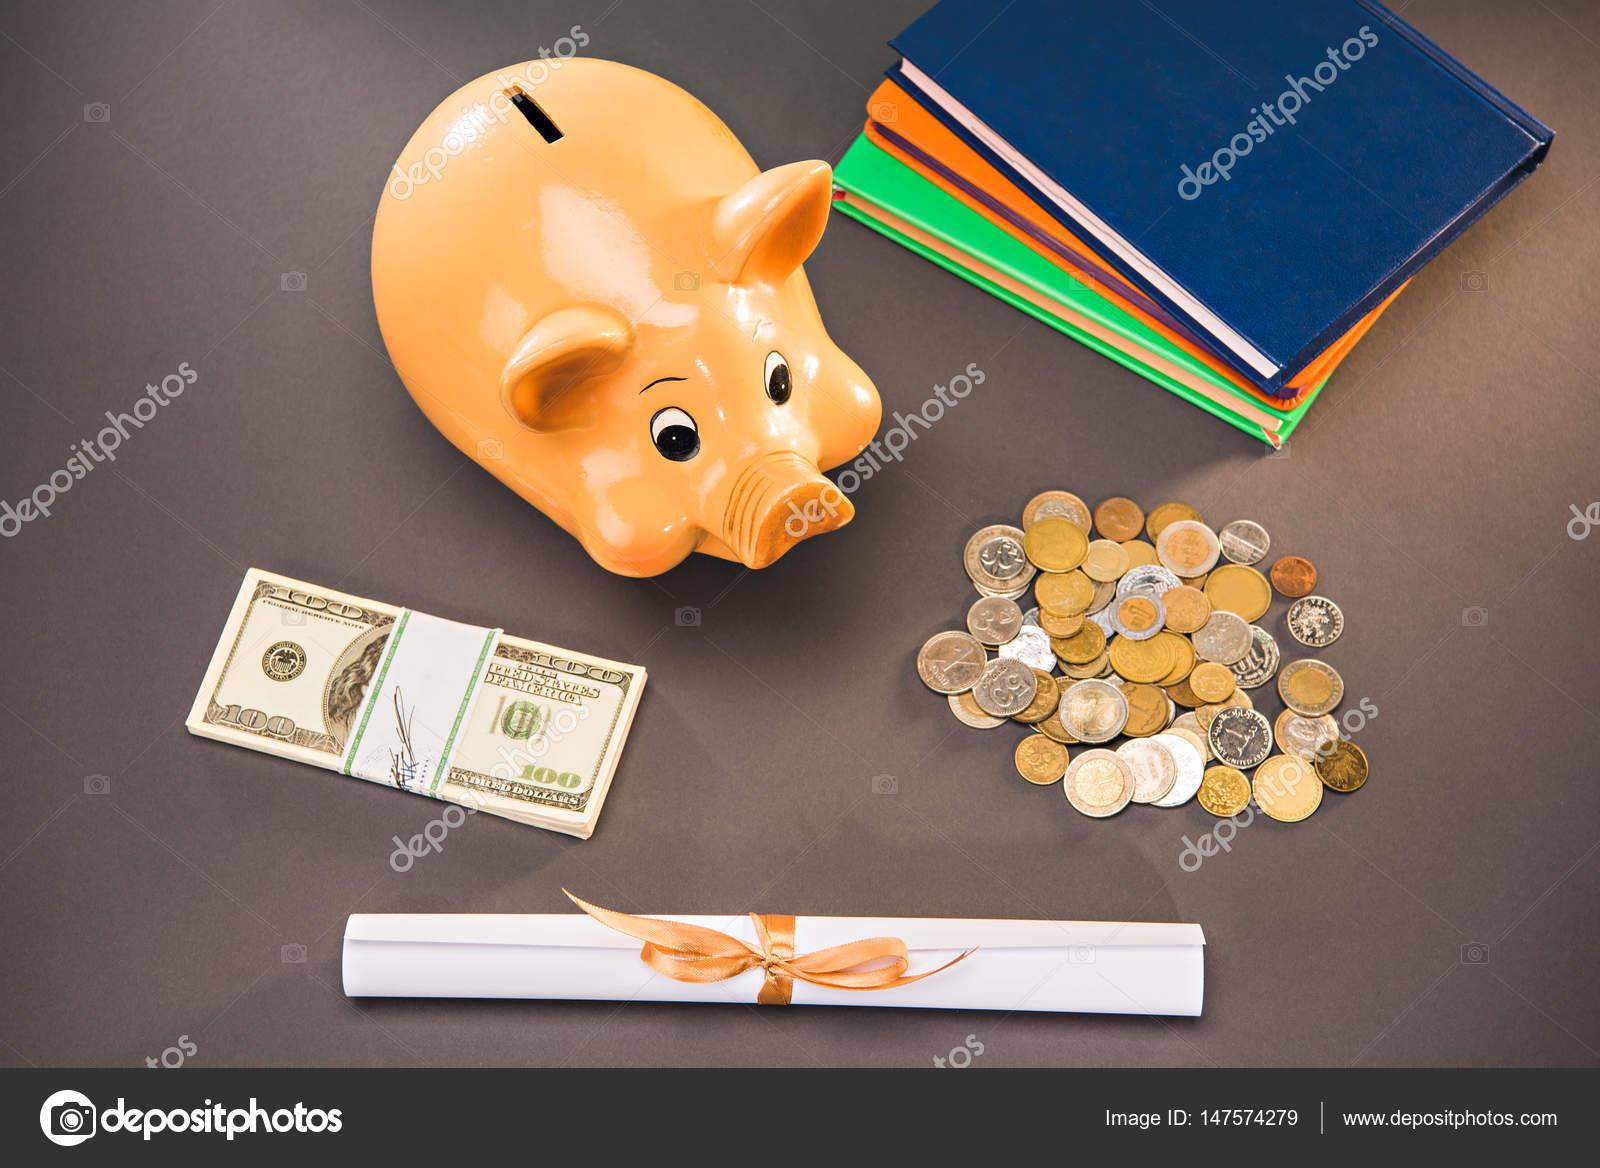 diploma and piggy bank stock photo © sergpoznanskiy  diploma and piggy bank stock photo 147574279